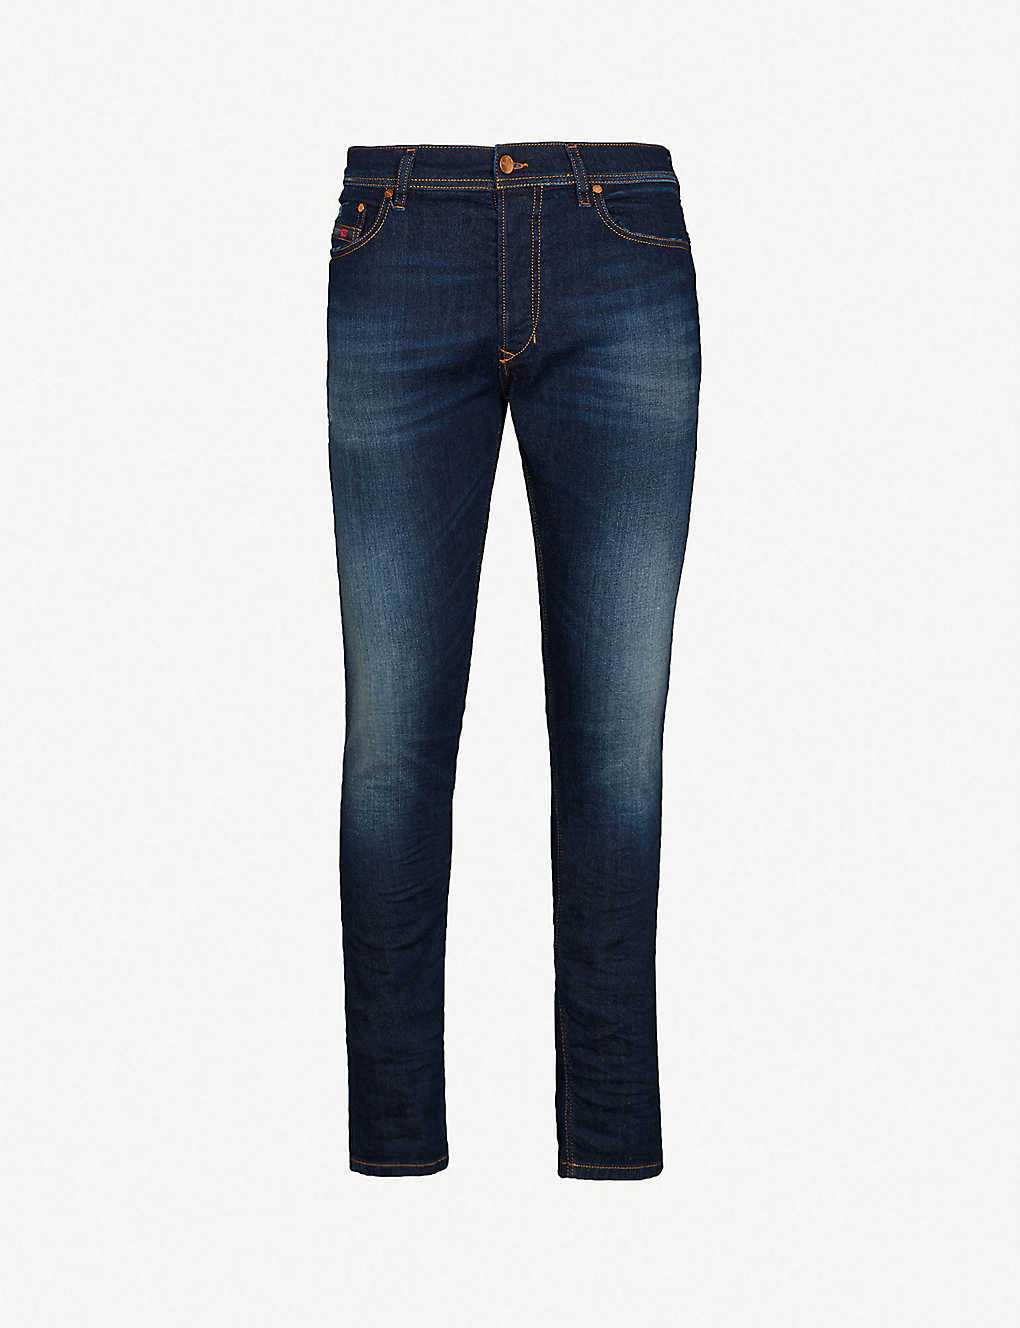 2fc0735d9cc2cf DIESEL - Tepphar slim-fit tapered jeans   Selfridges.com